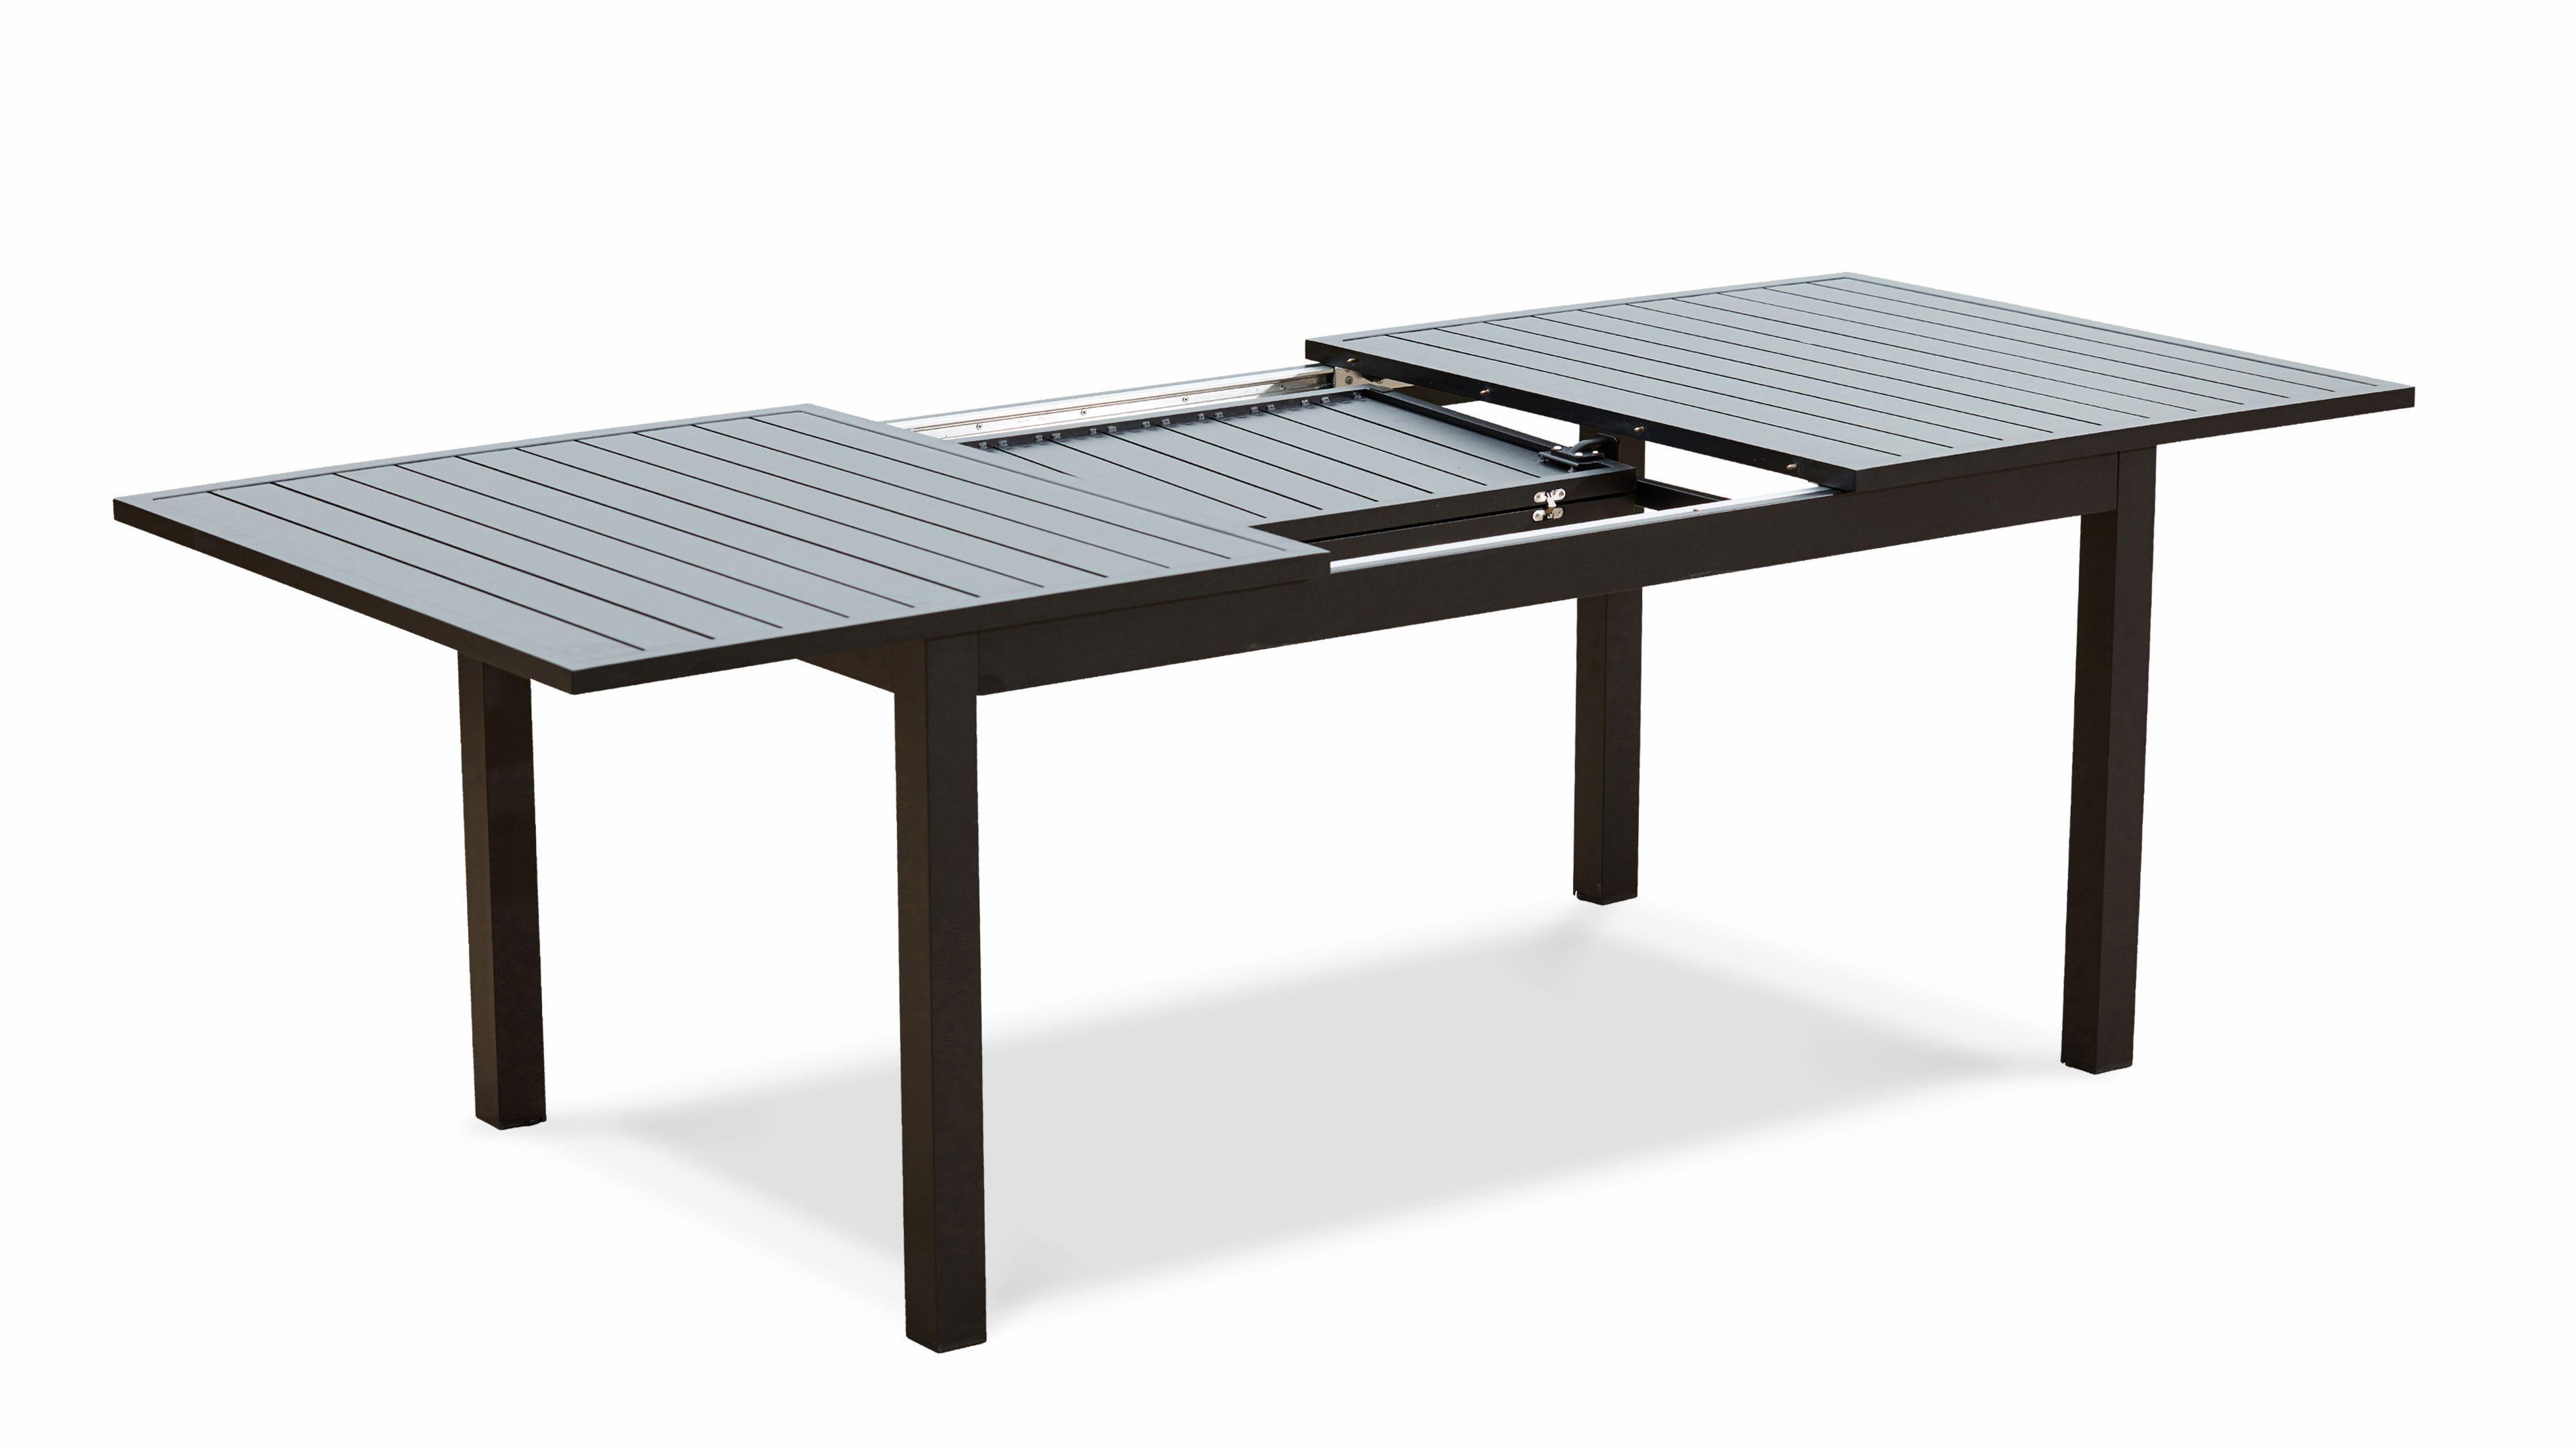 Table Jardin Extensible Rallonge 174/238 Cm Aluminium concernant Salon De Jardin Aluminium 8 Places